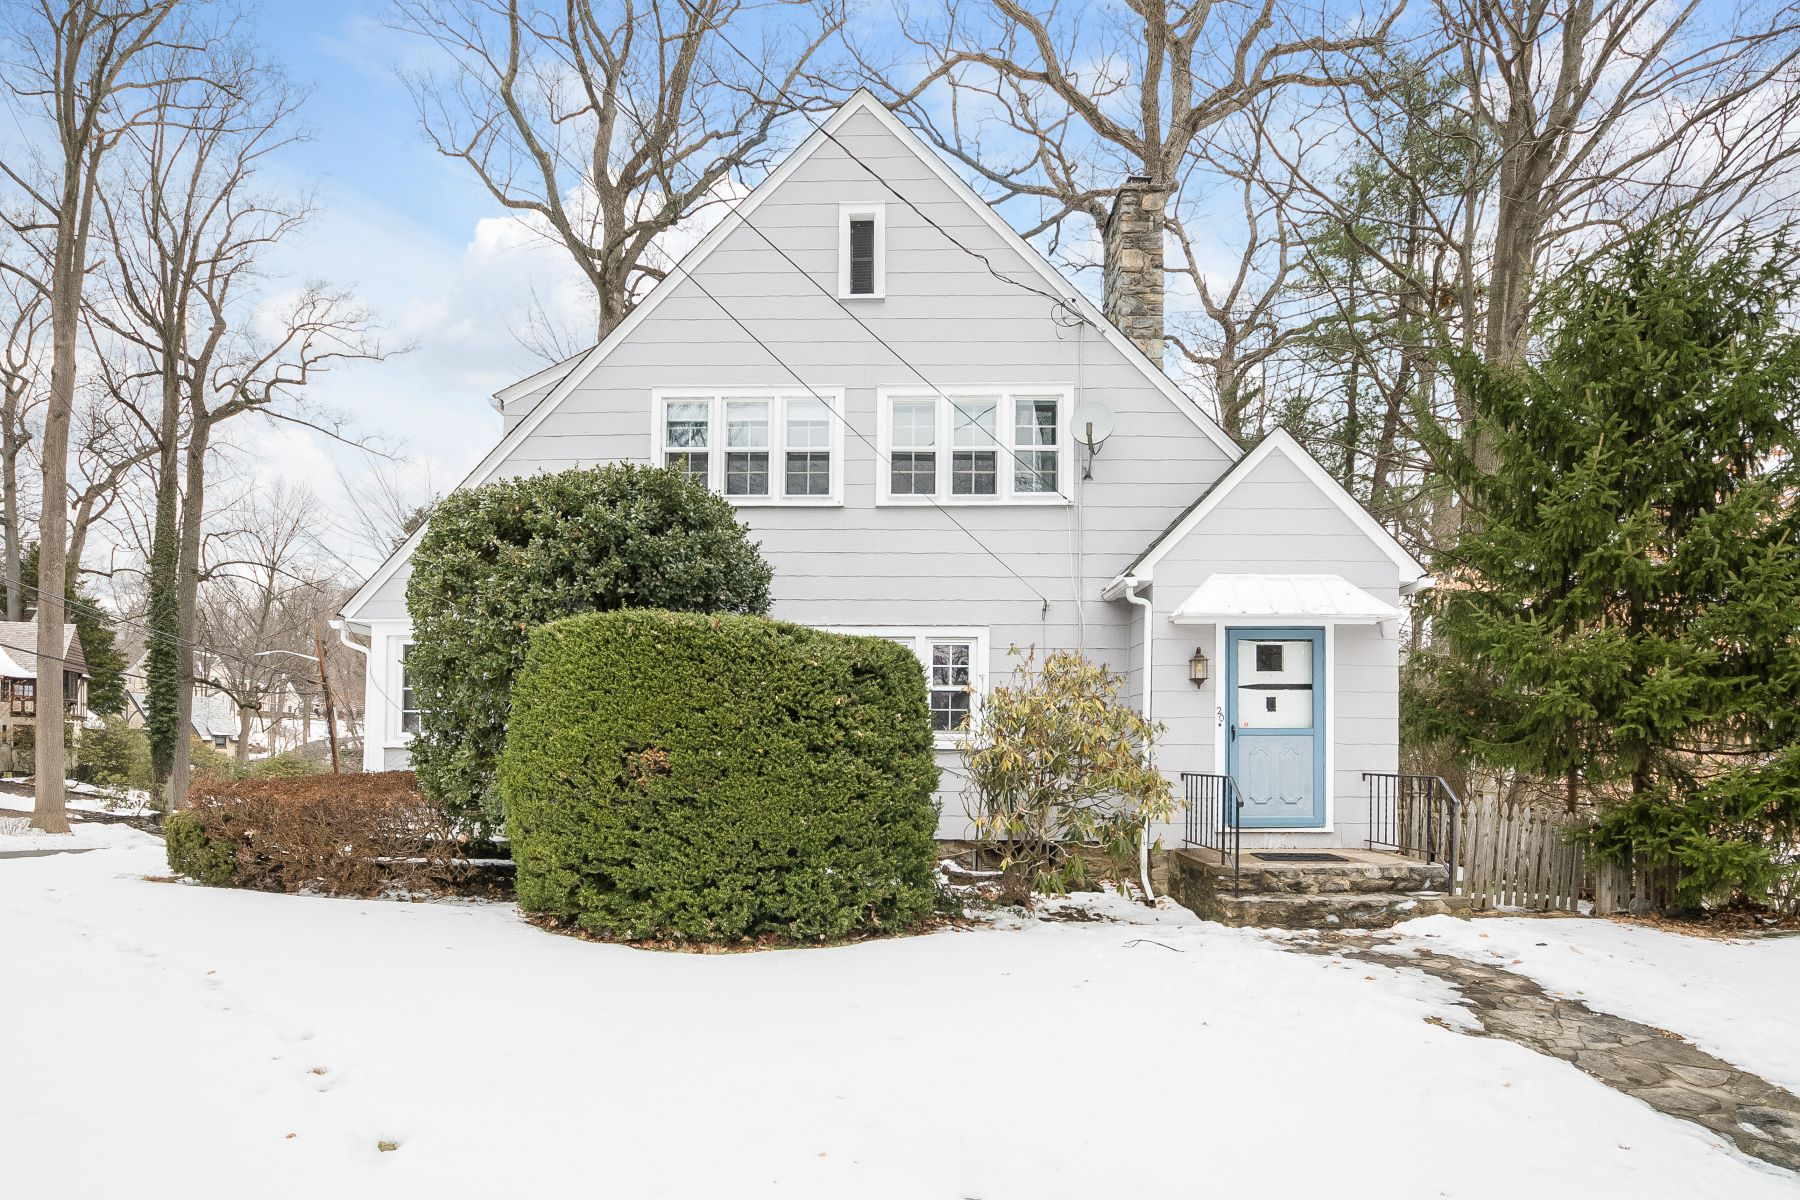 واحد منزل الأسرة للـ Sale في Charming Colonial on Corner Lot 20 Glenwood Road, Scarsdale, New York, 10583 United States